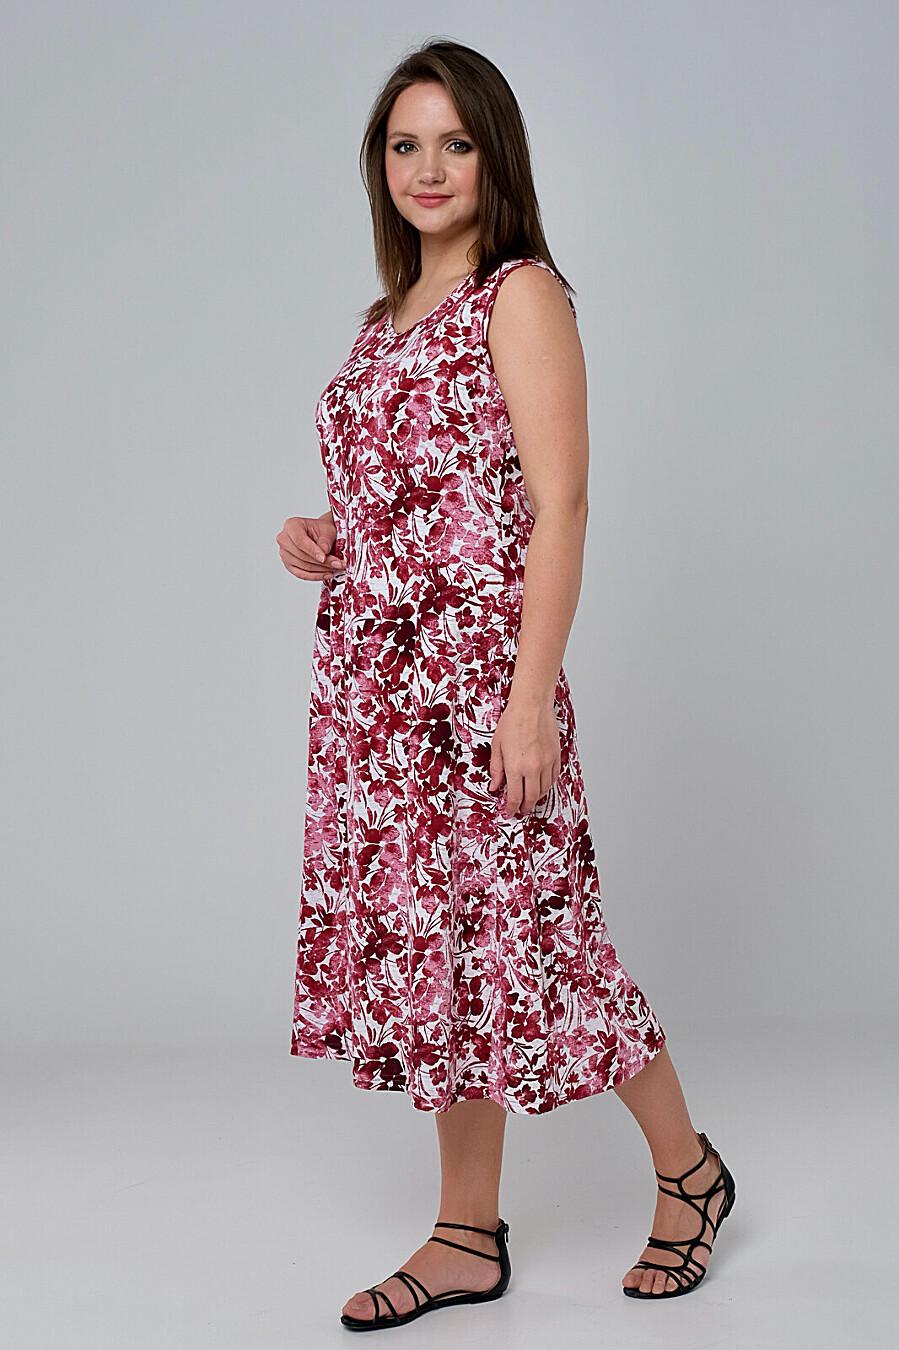 Сарафан ODEVAITE (308451), купить в Moyo.moda